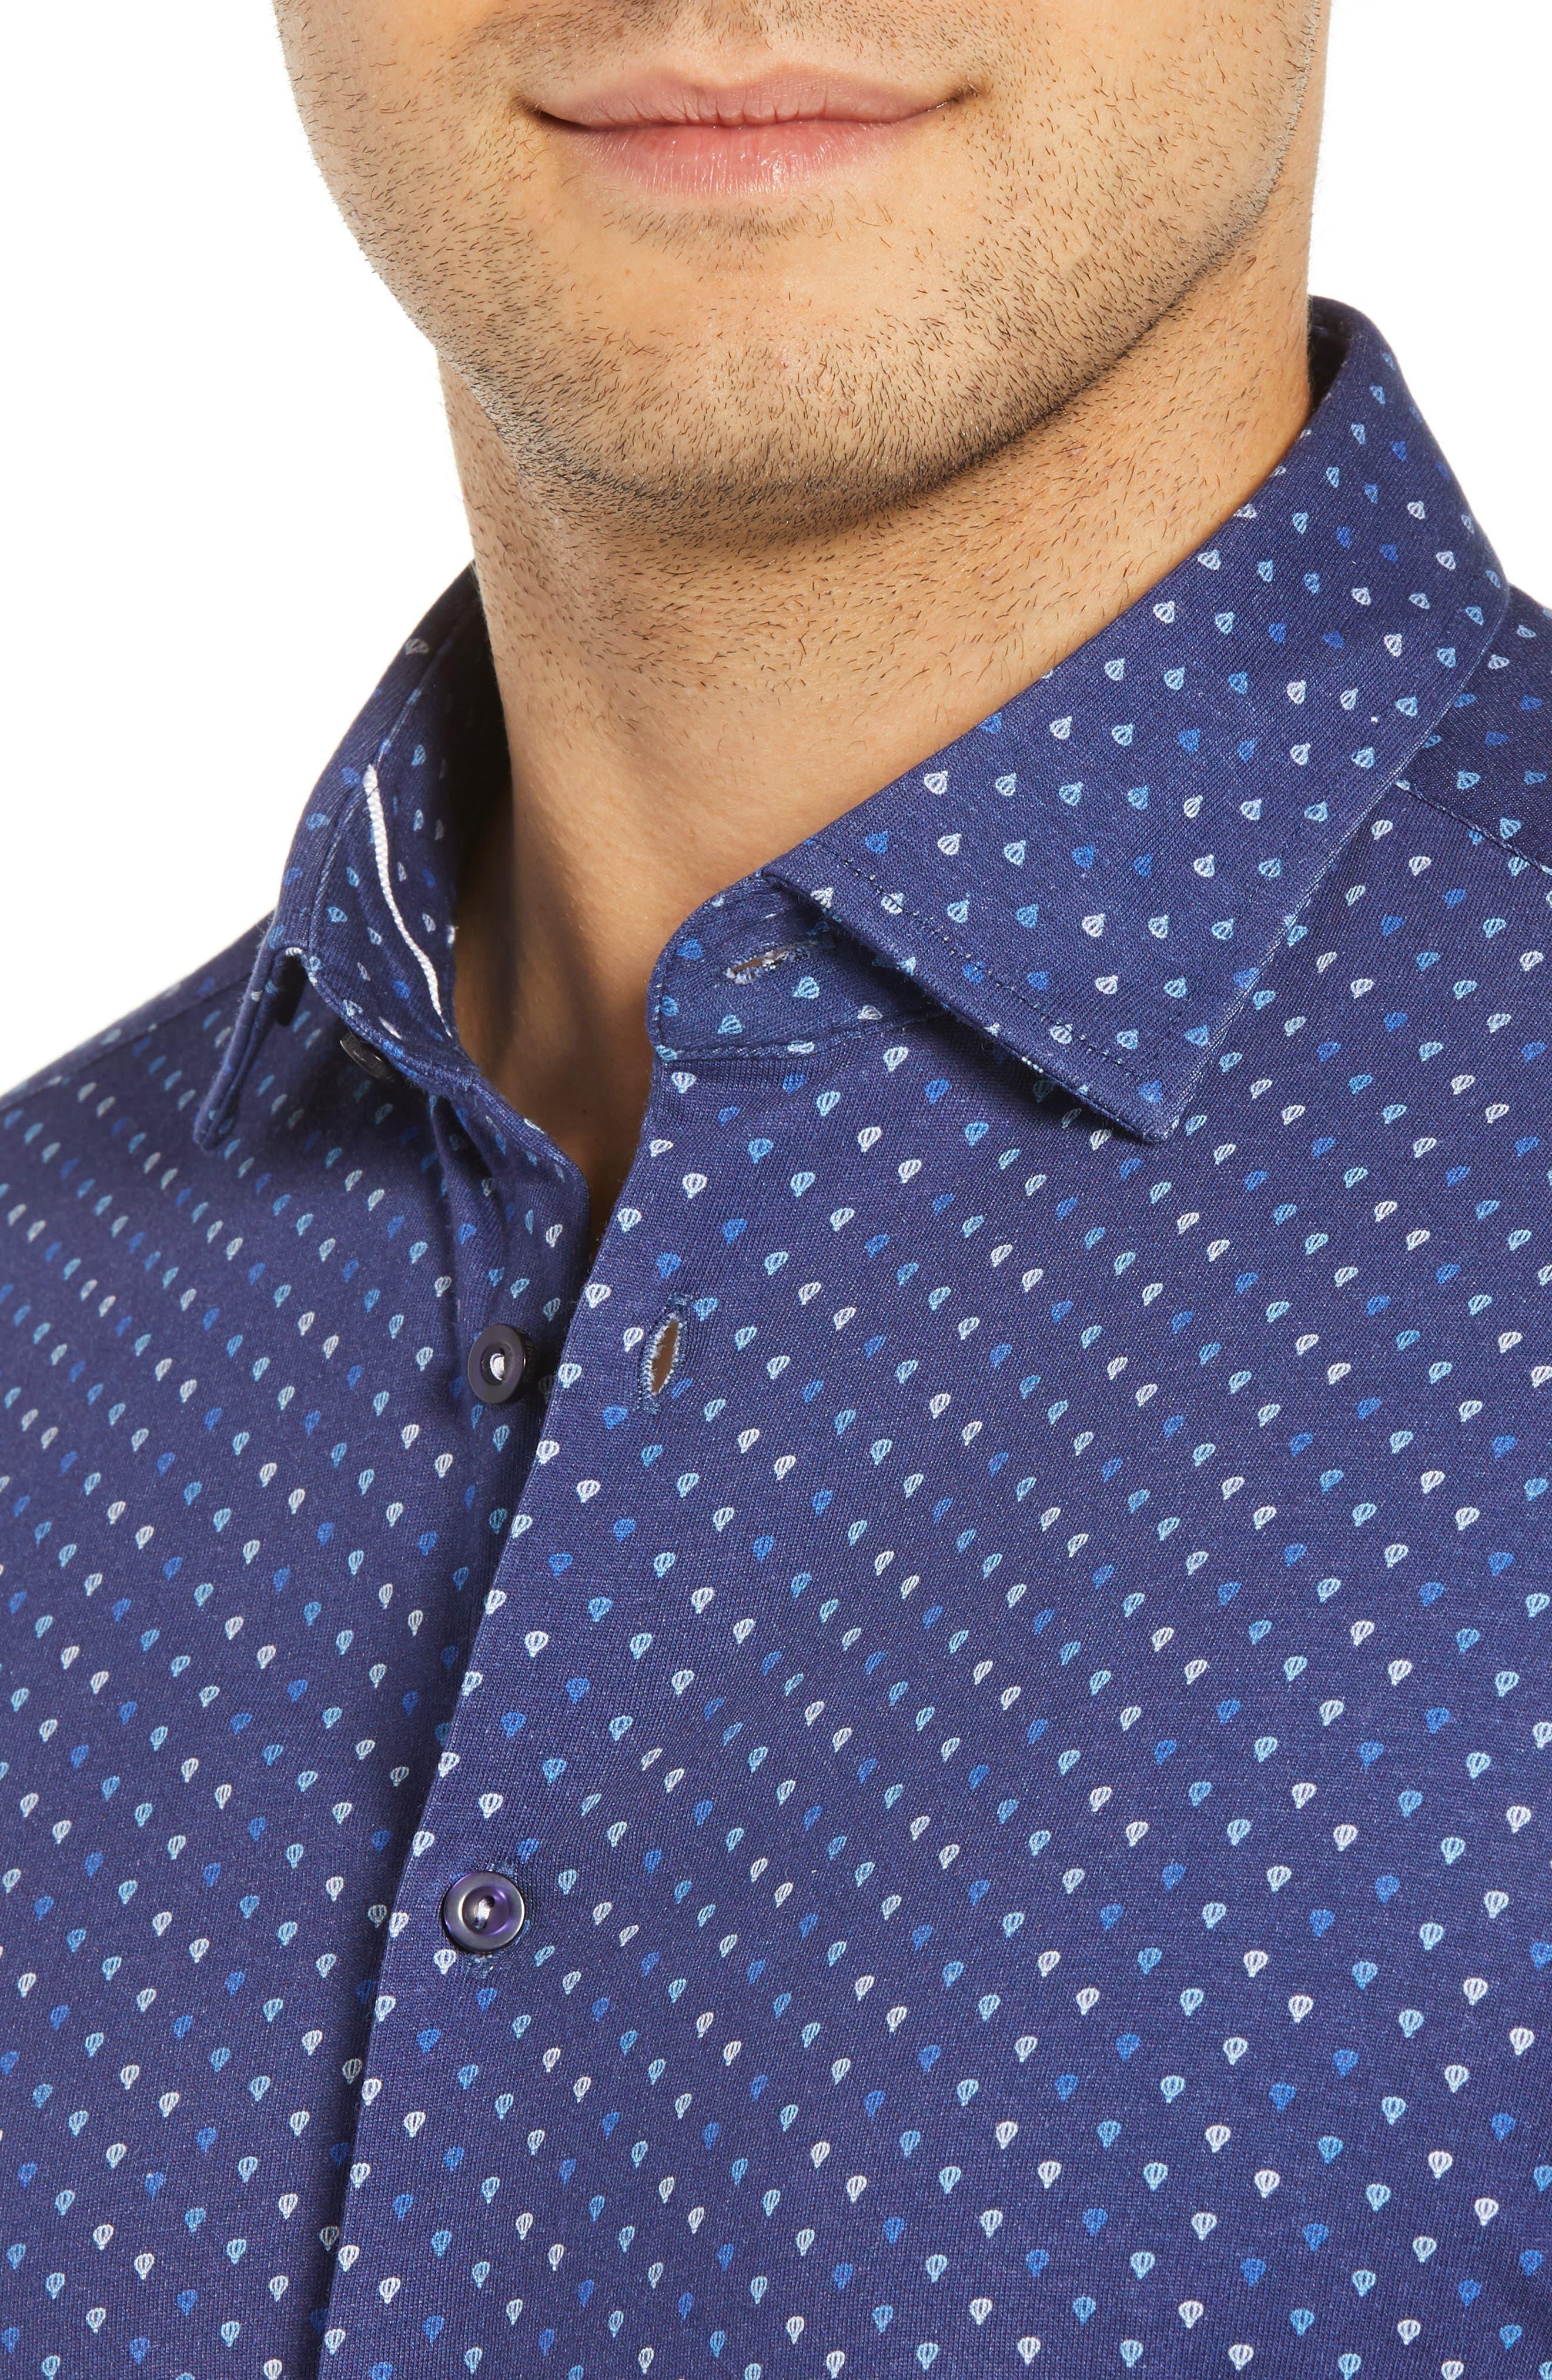 Regular Fit Sport Shirt,                             Alternate thumbnail 2, color,                             NAVY